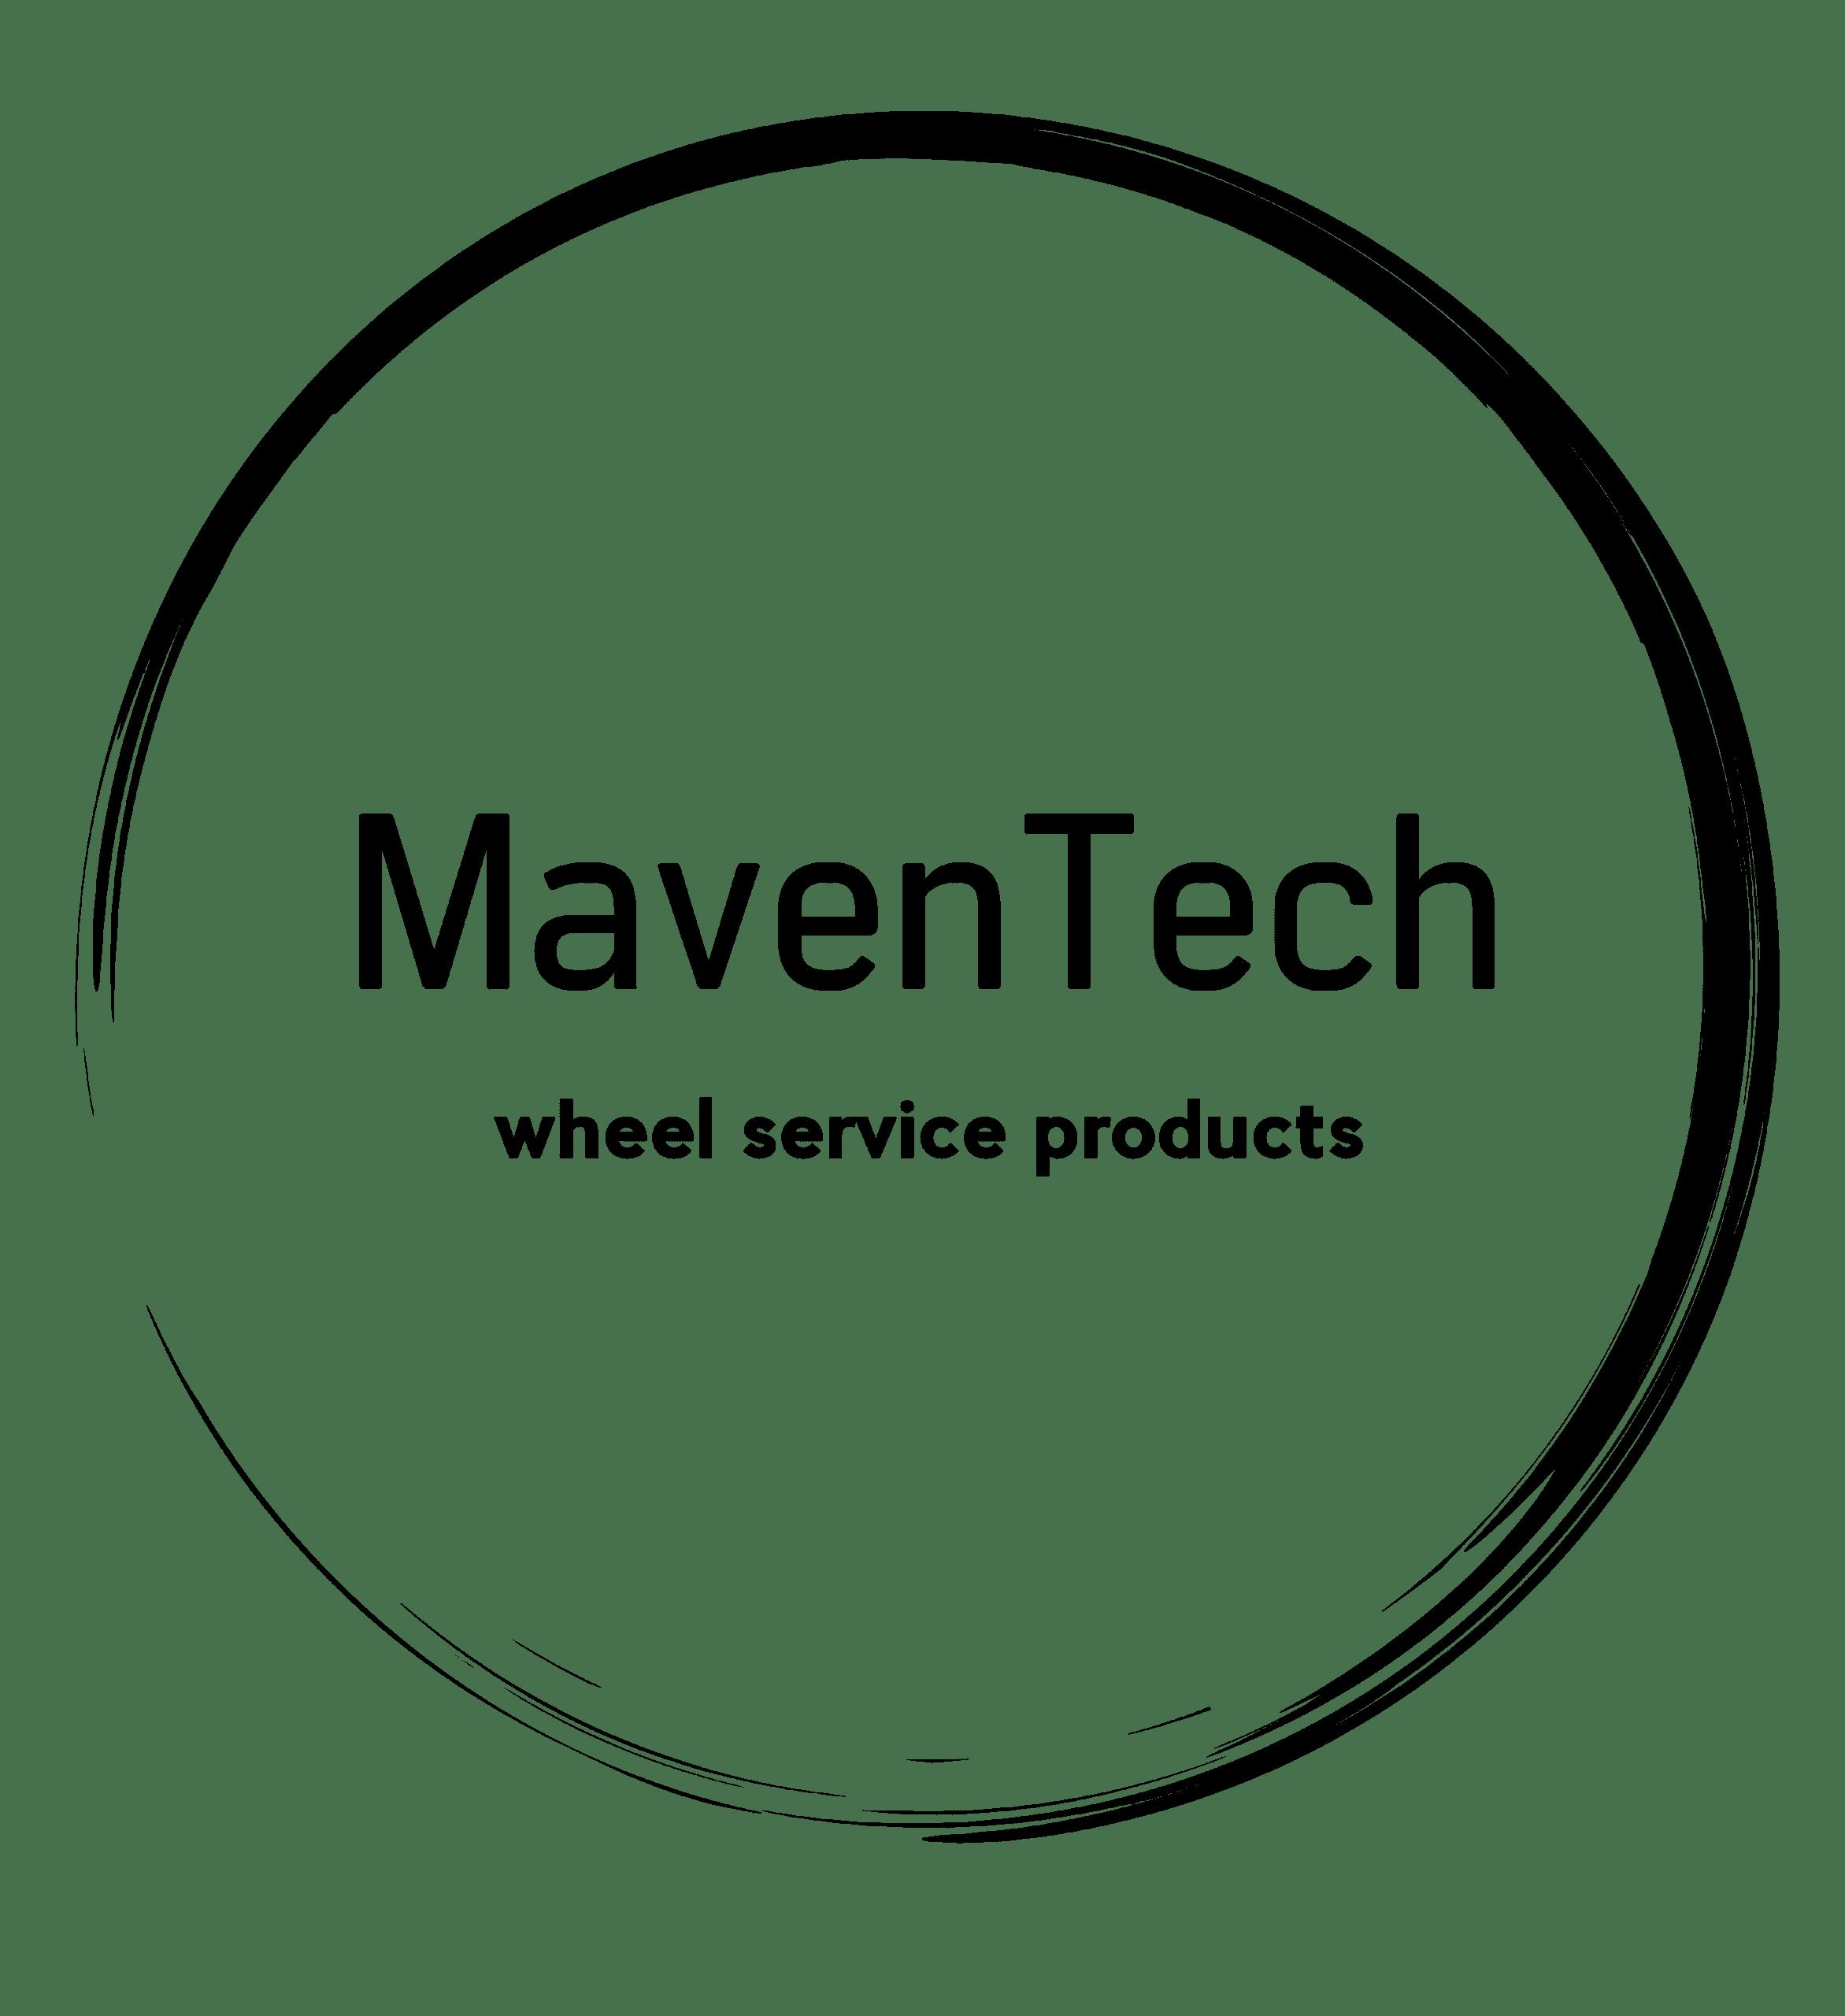 MavenTech Wheel Service Products logo